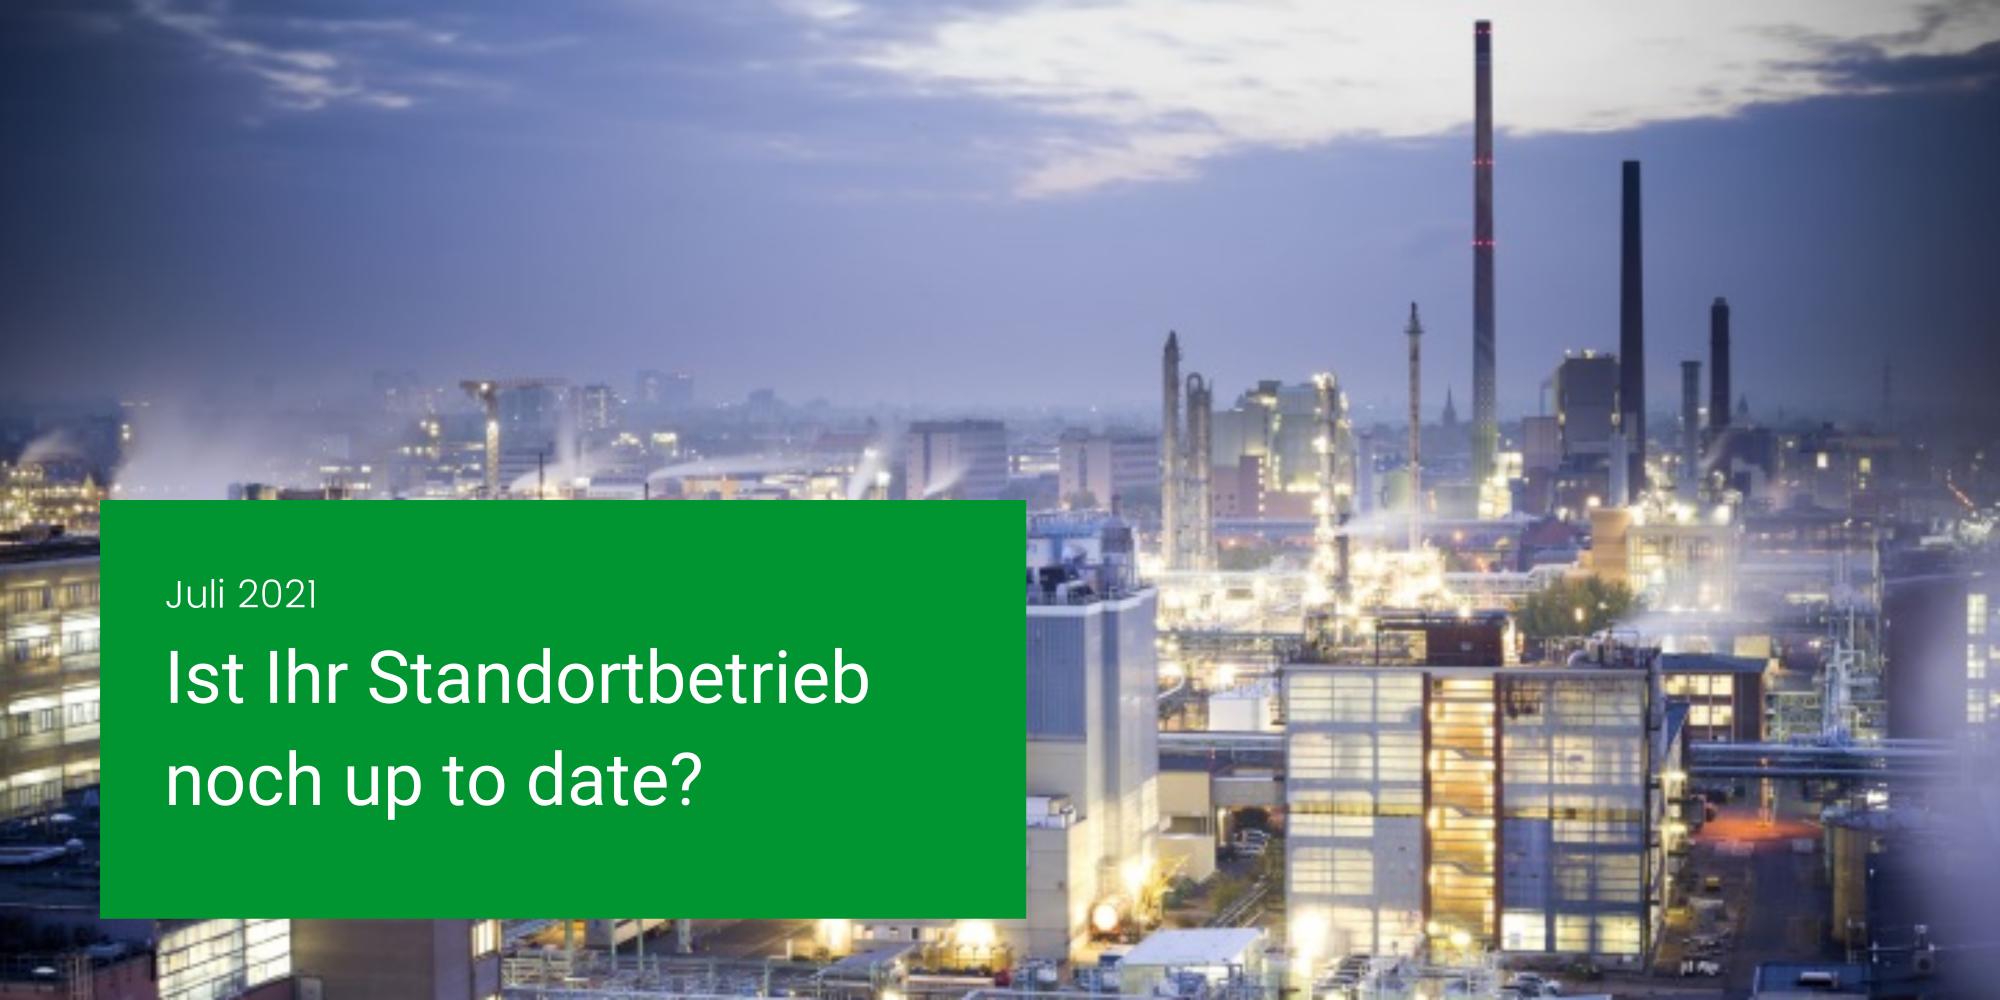 Header image which shows a laboratory and a green box with a headline: April 2021, Gebäudeleittechnik und Industrie 4.0